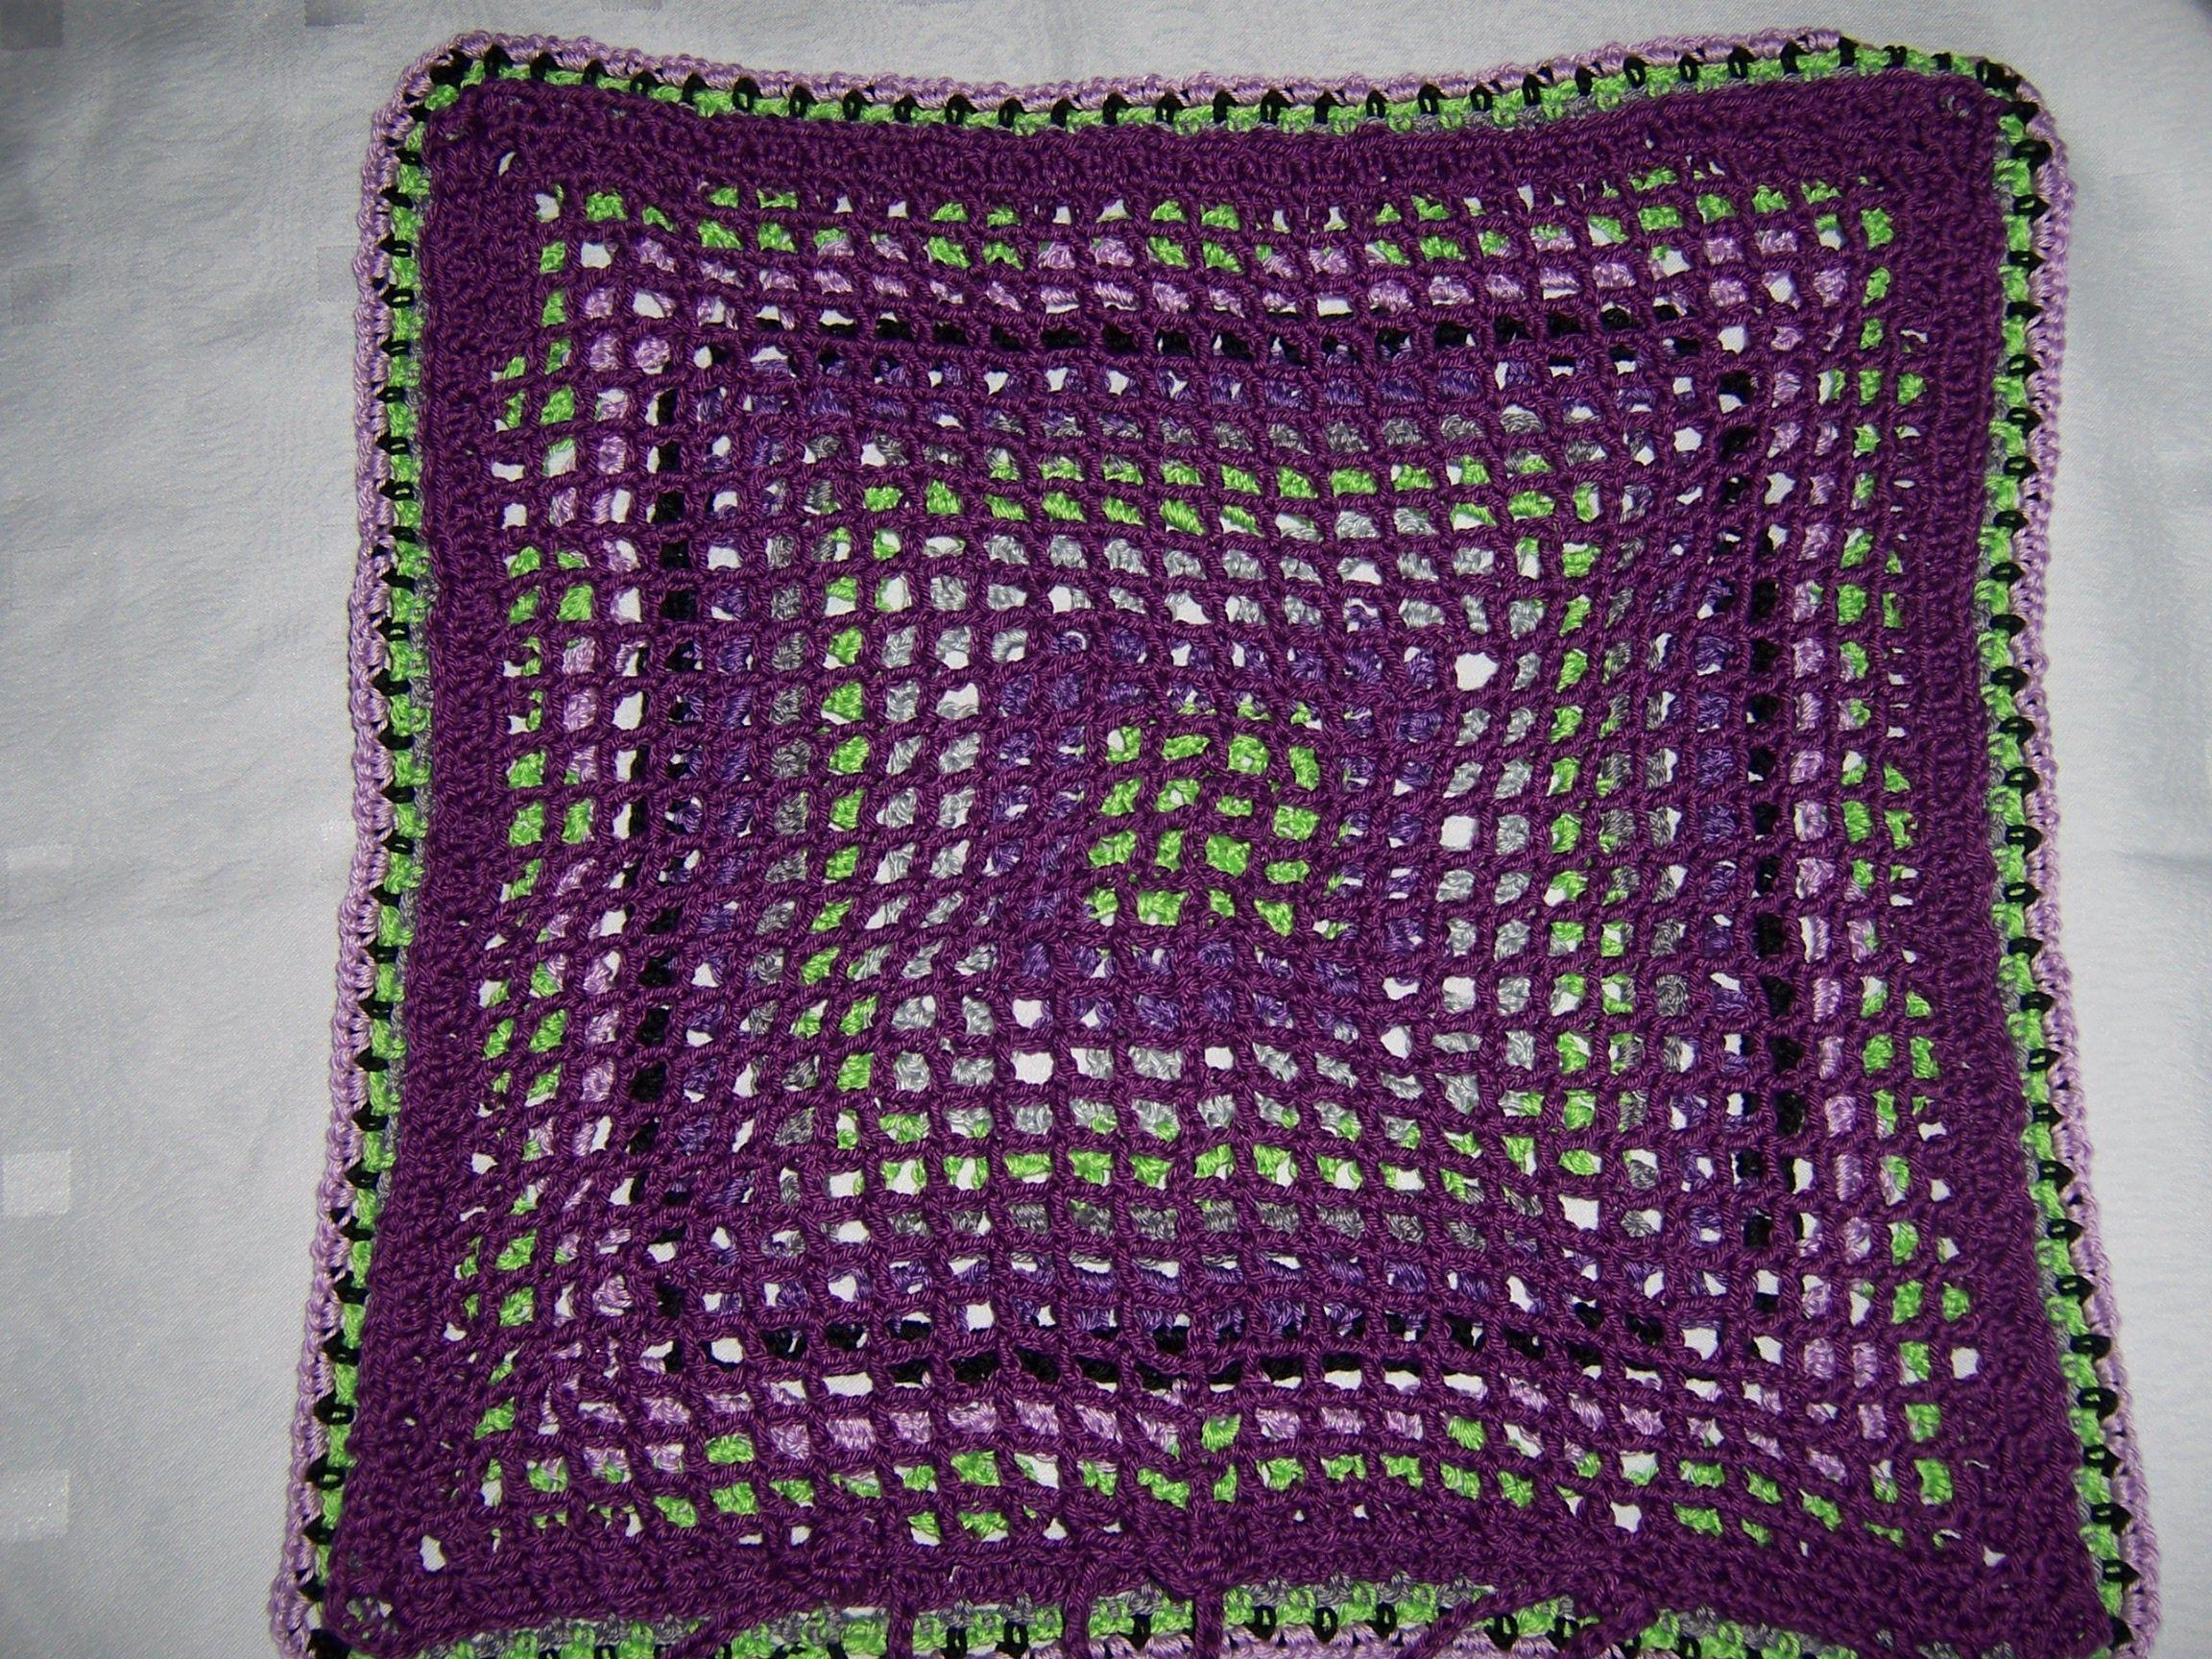 Kissenbezug häkeln Rückseite - big granny crochet | Häkeln Decken ...